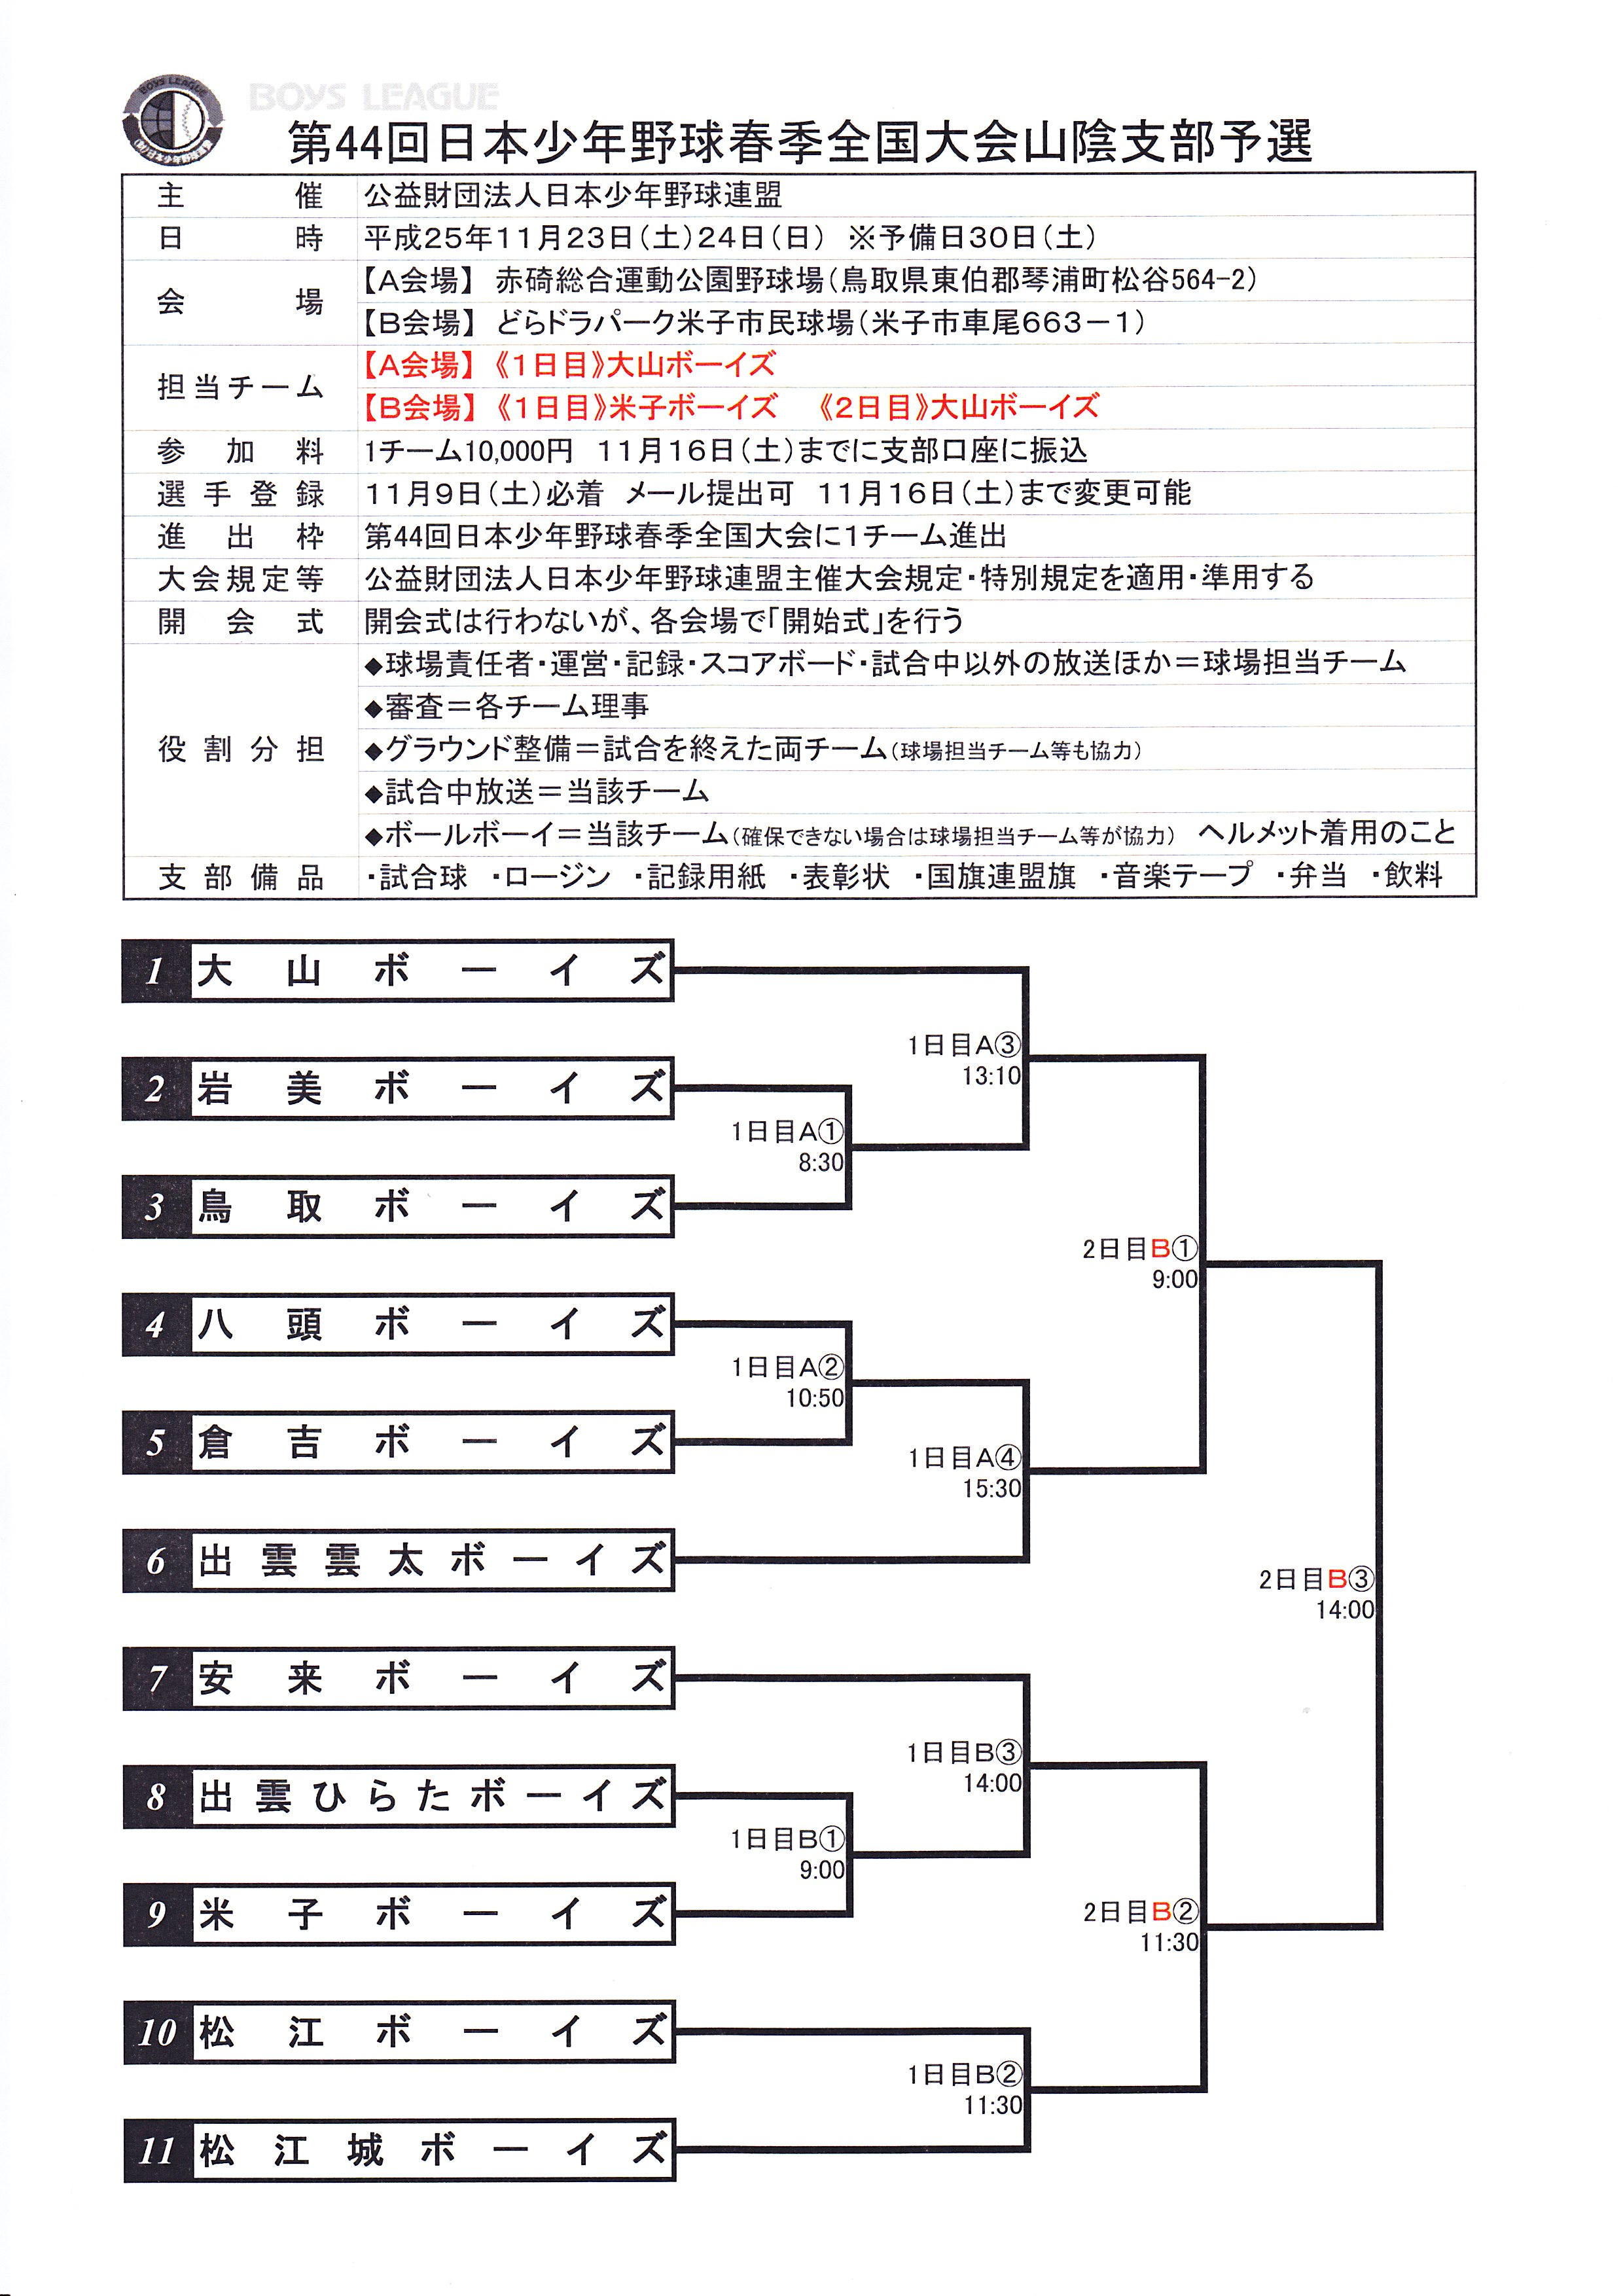 tournament_syunkiyosen1.jpg